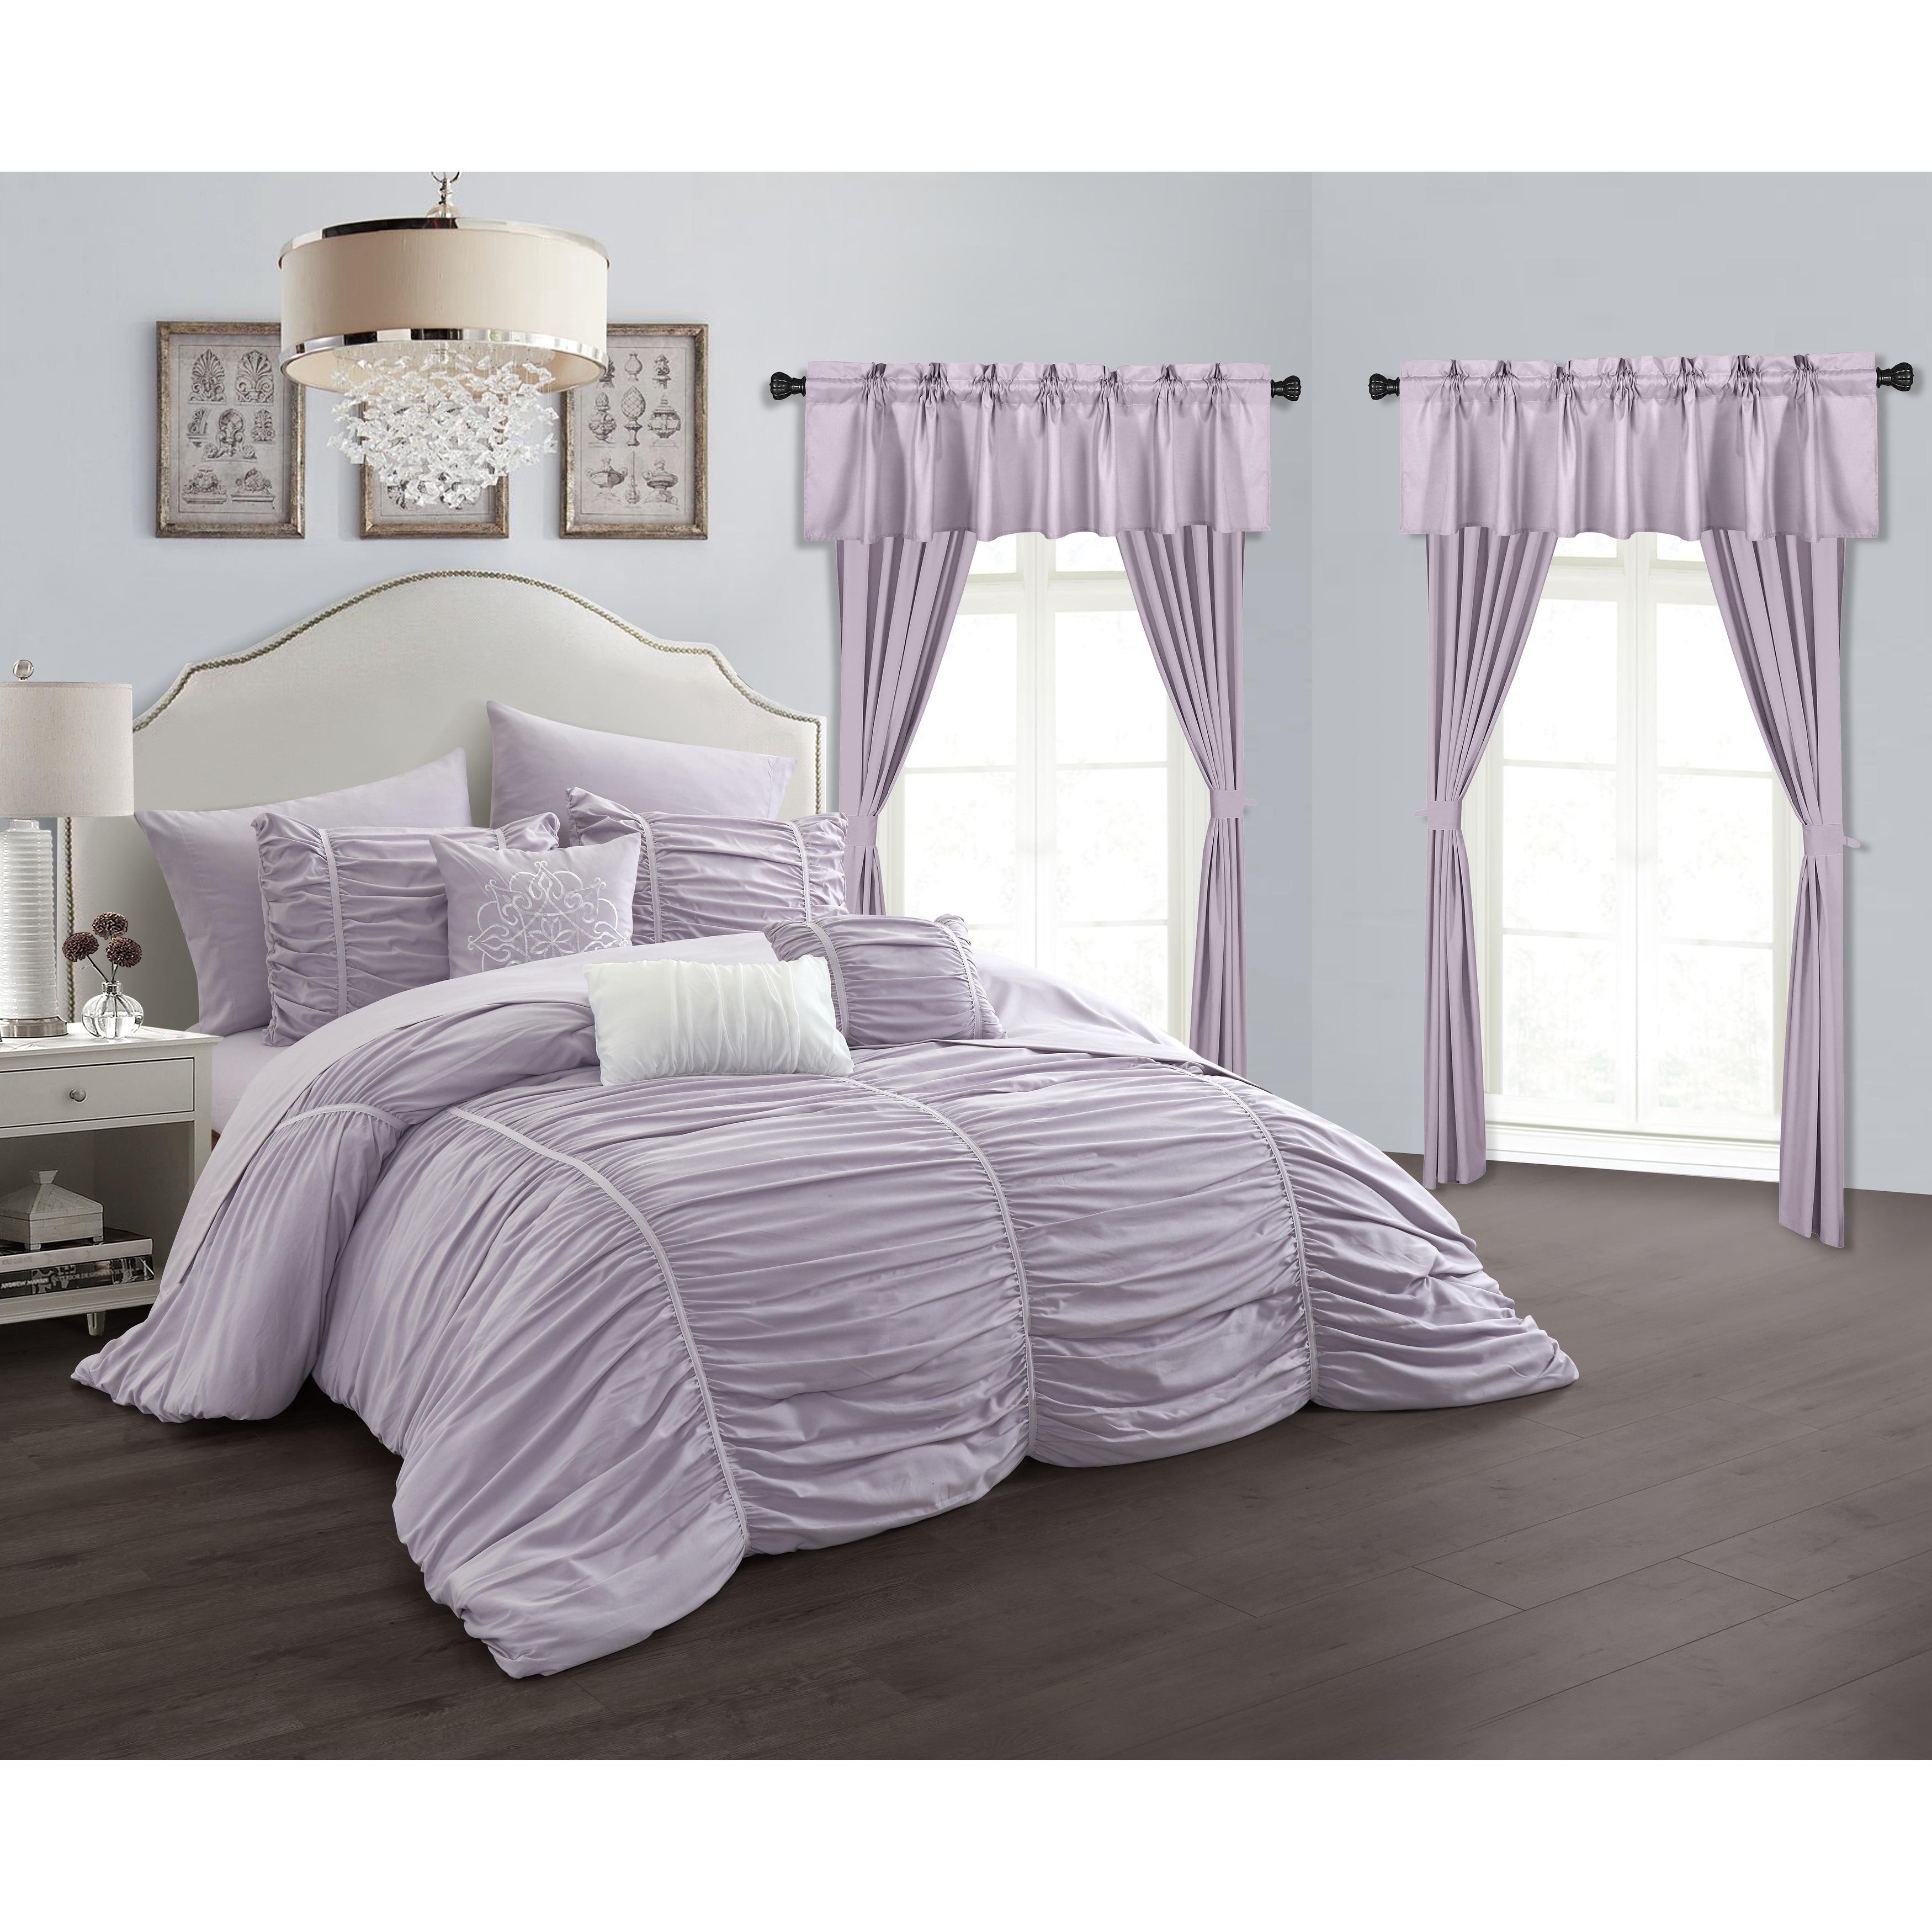 Chic Home Hallstatt 20 Piece Comforter Set Designer Bed In A Bag Bedding Lilac On Sale Overstock 20759629